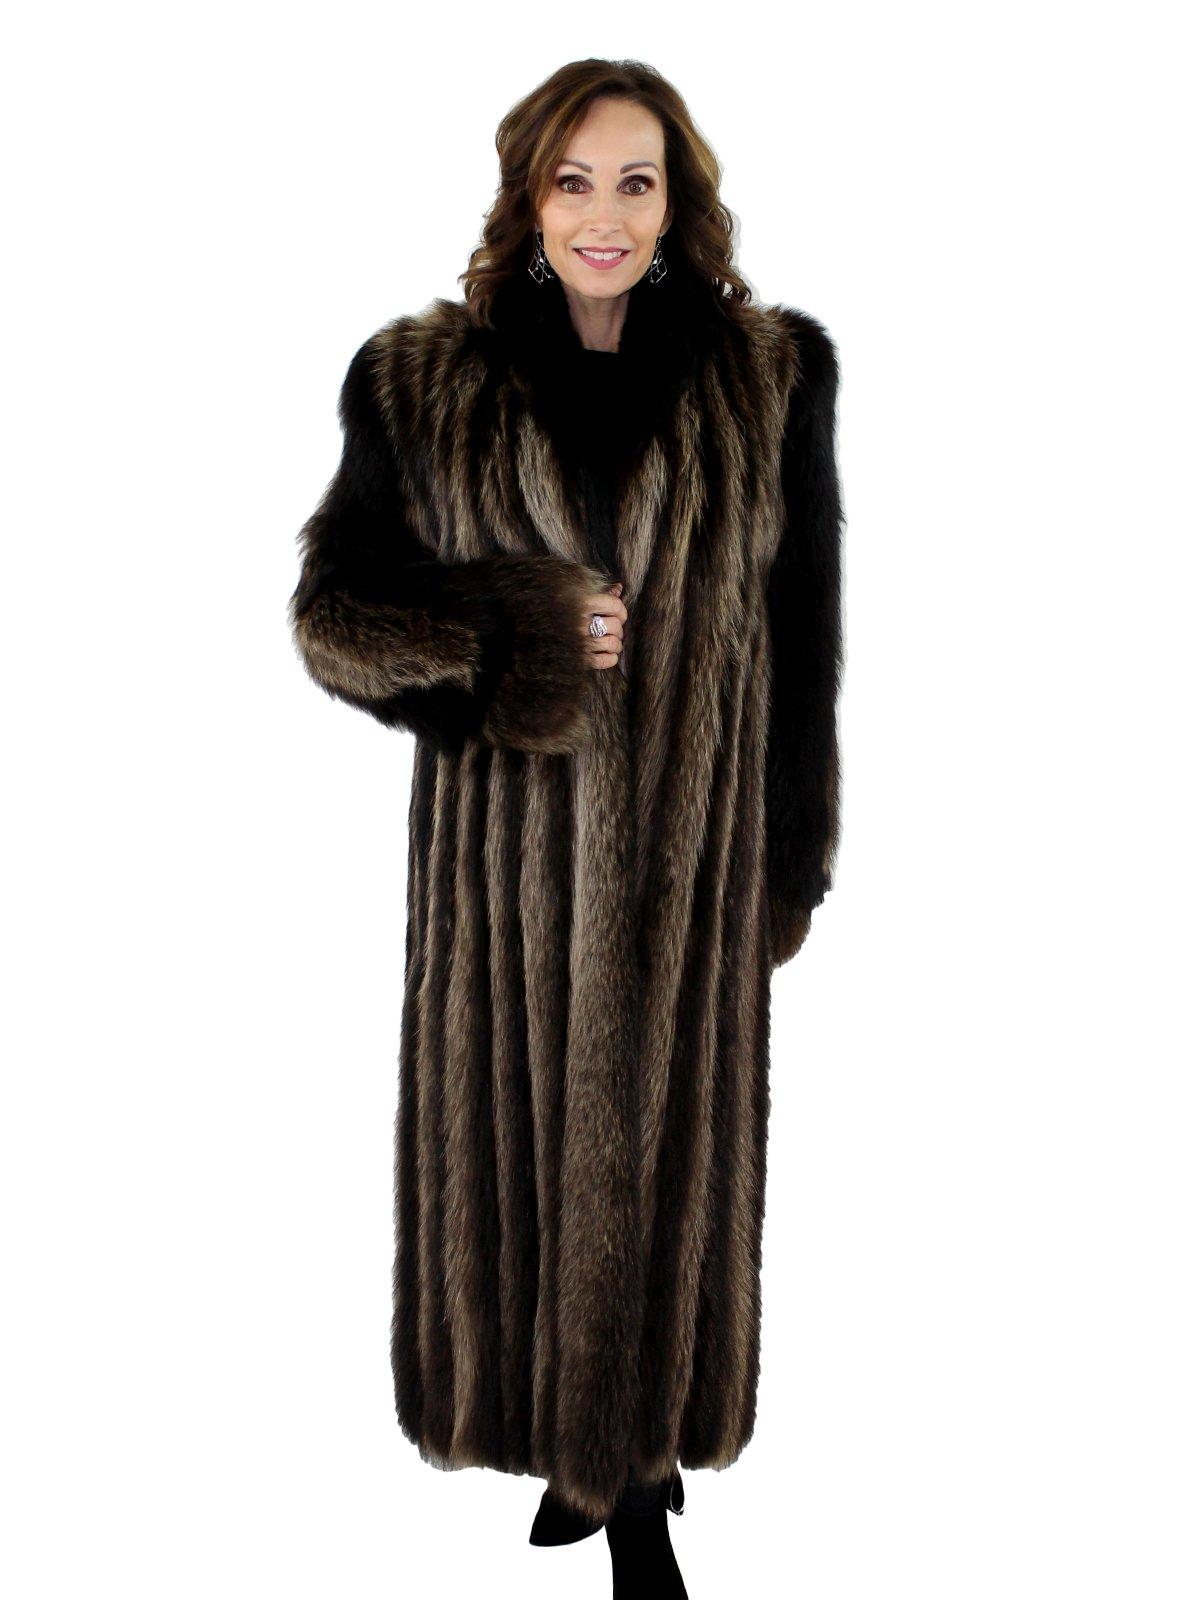 bee965b0e Natural Raccoon Fur Coat with Black Fox Fur Trim - Women's Fur Coat ...